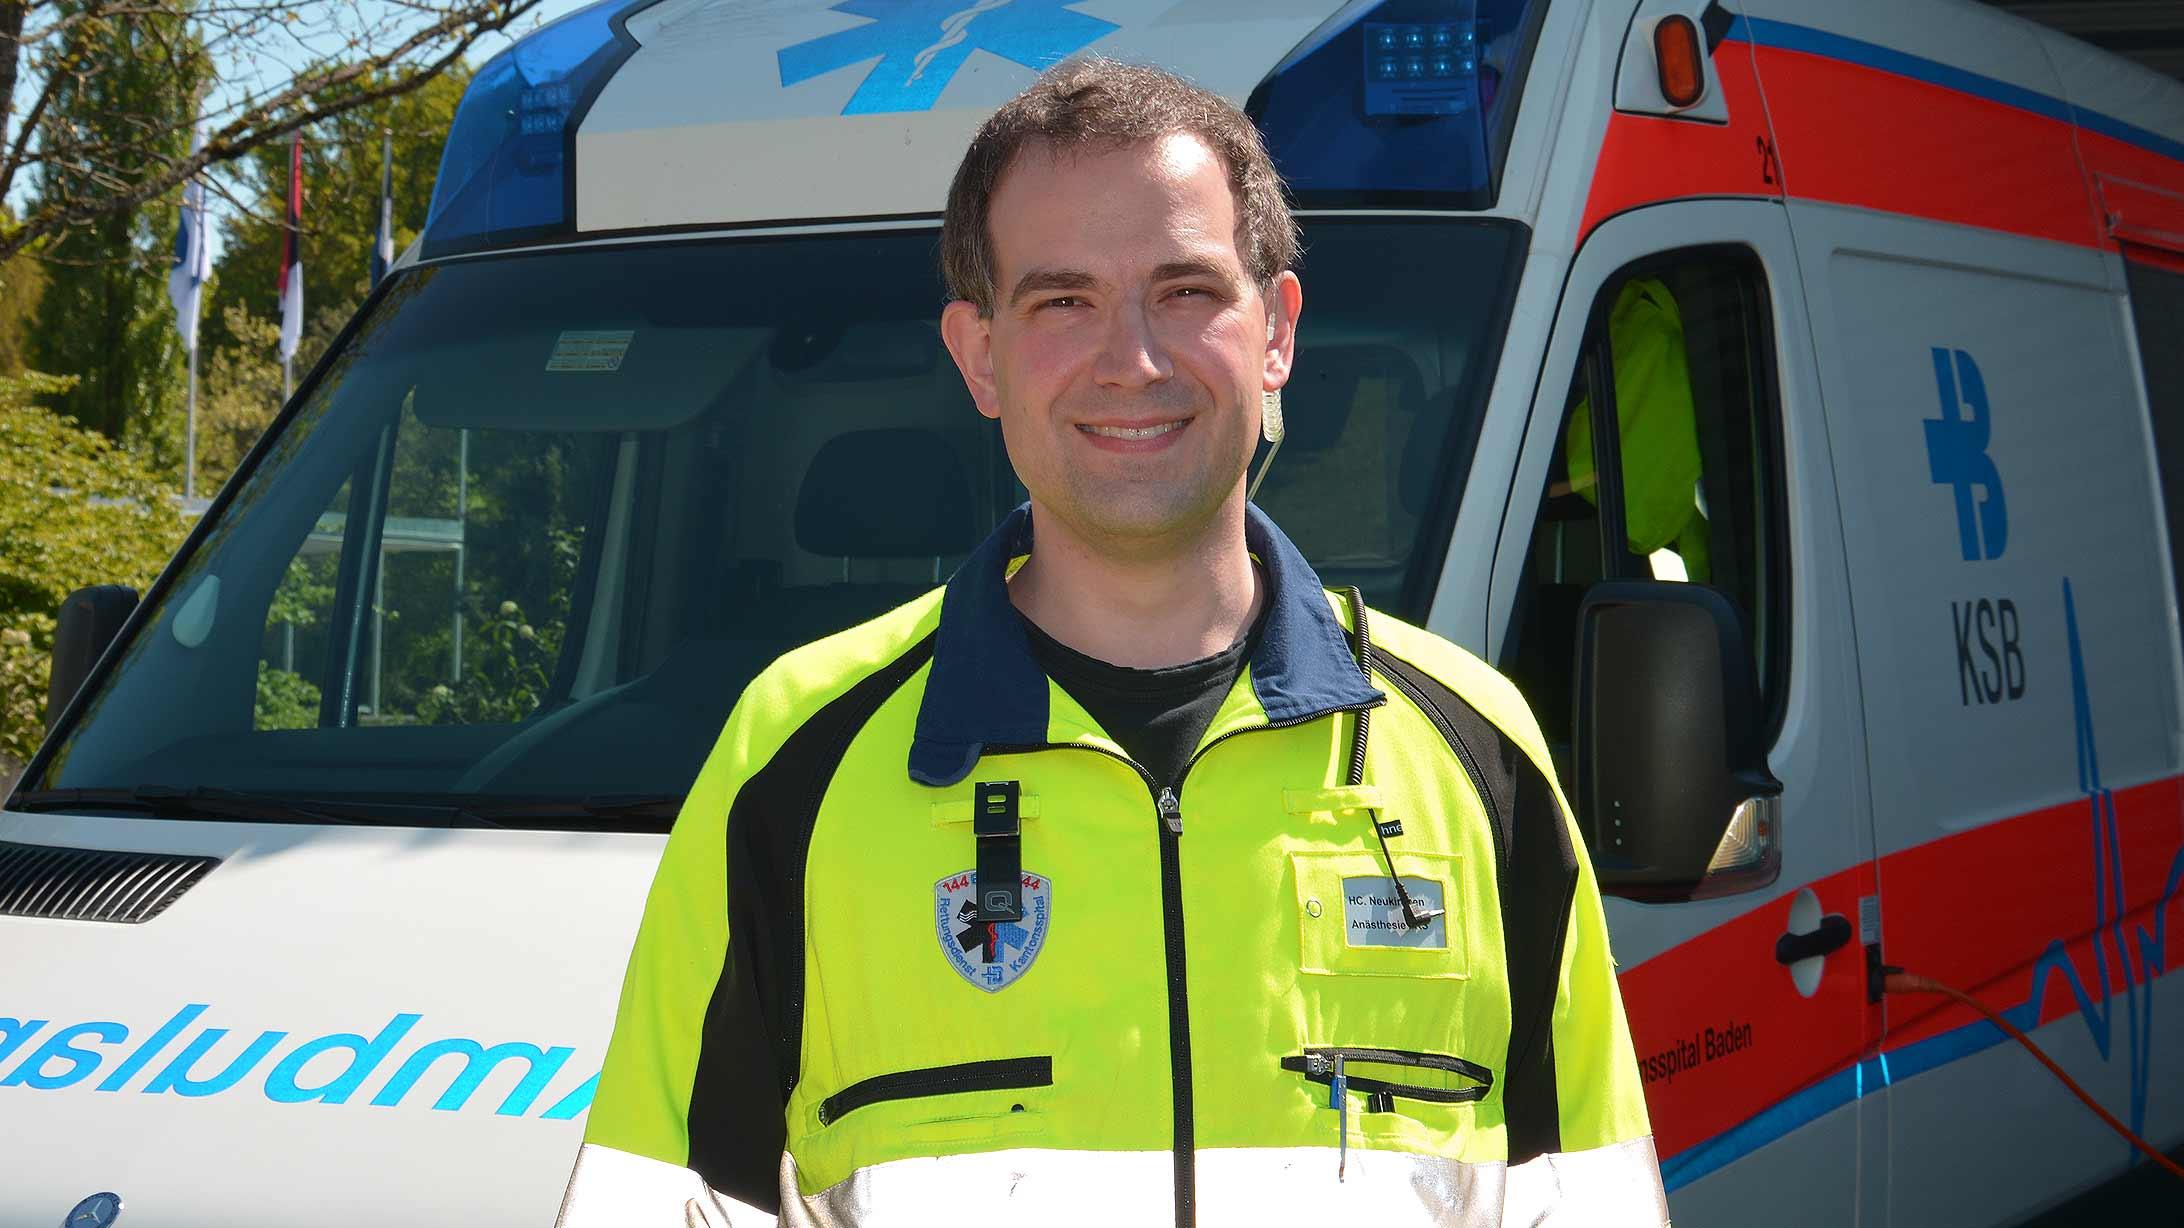 Rettungssanitäter Christian Neukirchen vor dem Rettungswagen